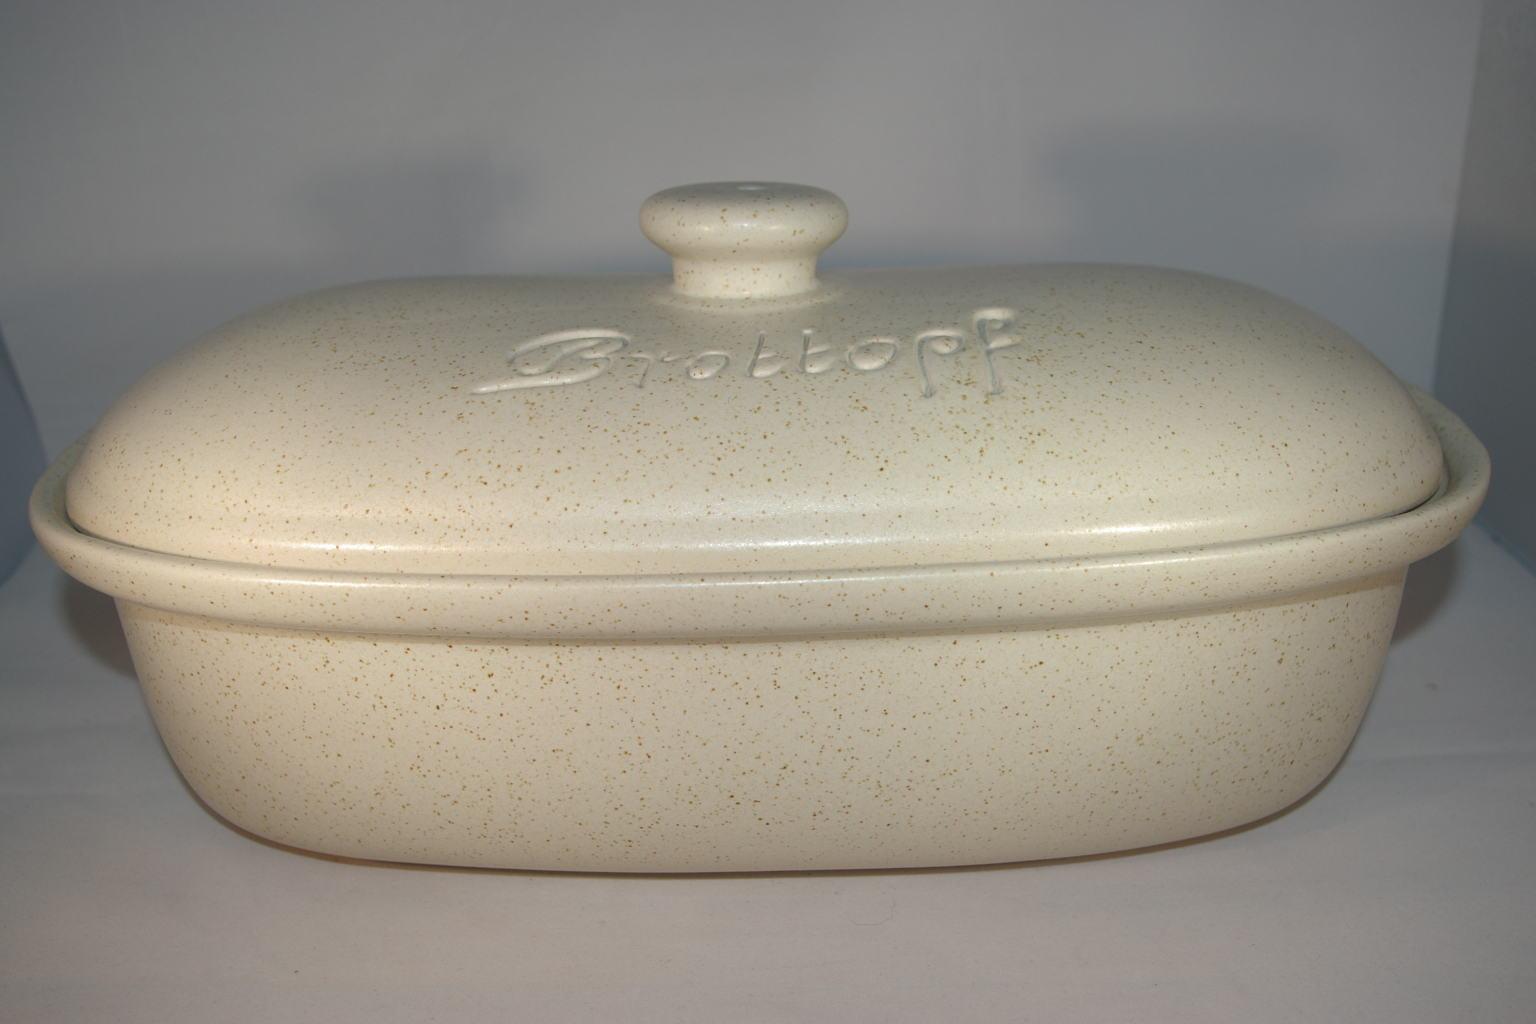 Ton Keramik Unterschied unterschied ton keramik 28 images brottopf familie keramik